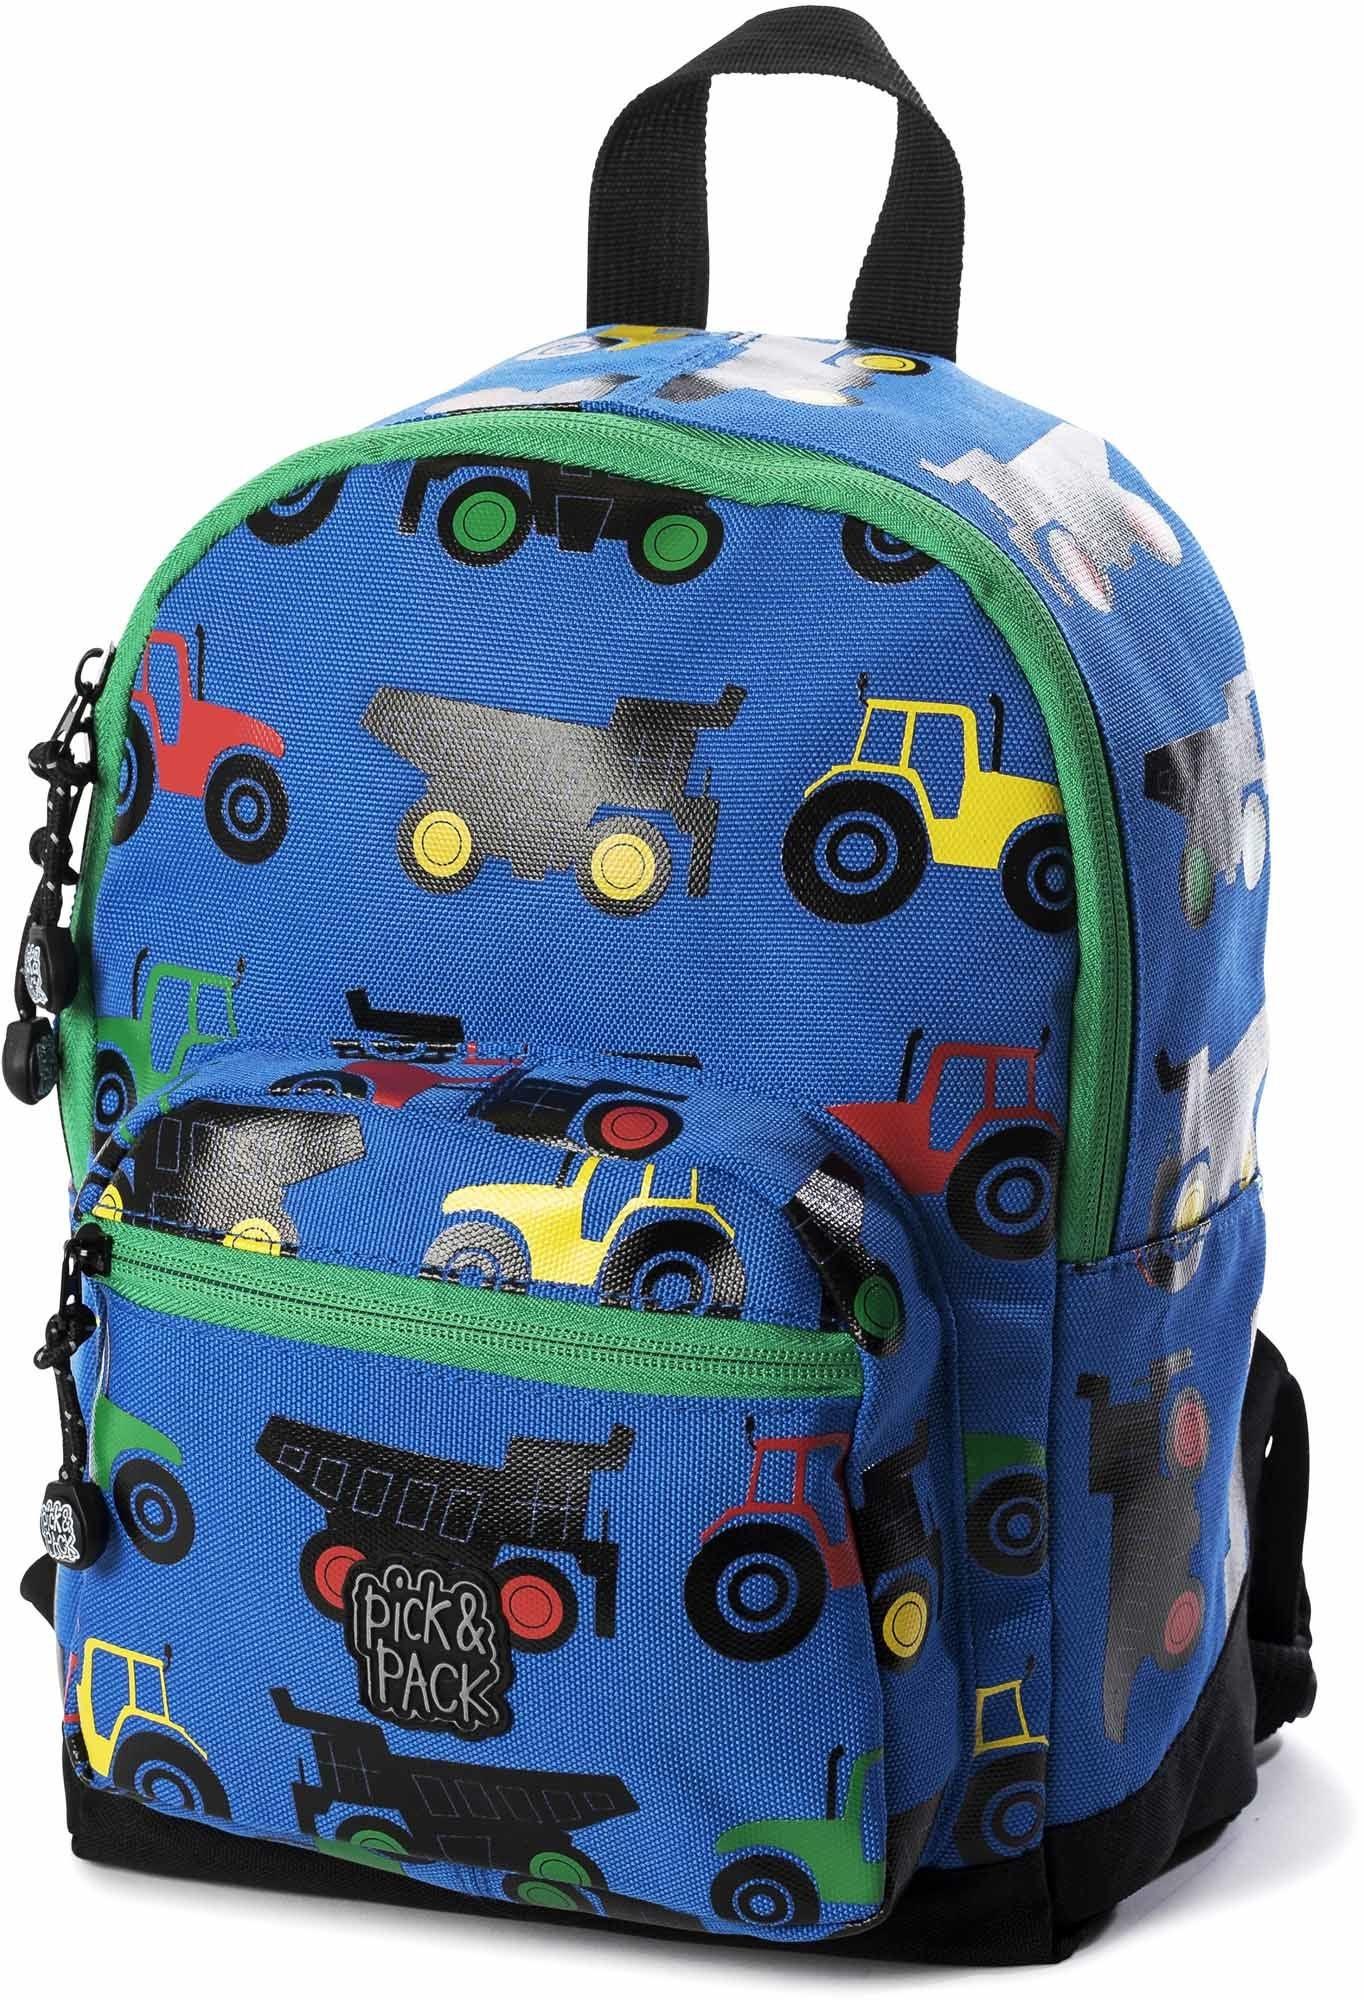 Pick & Pack Ryggsäck Traktor, Blue